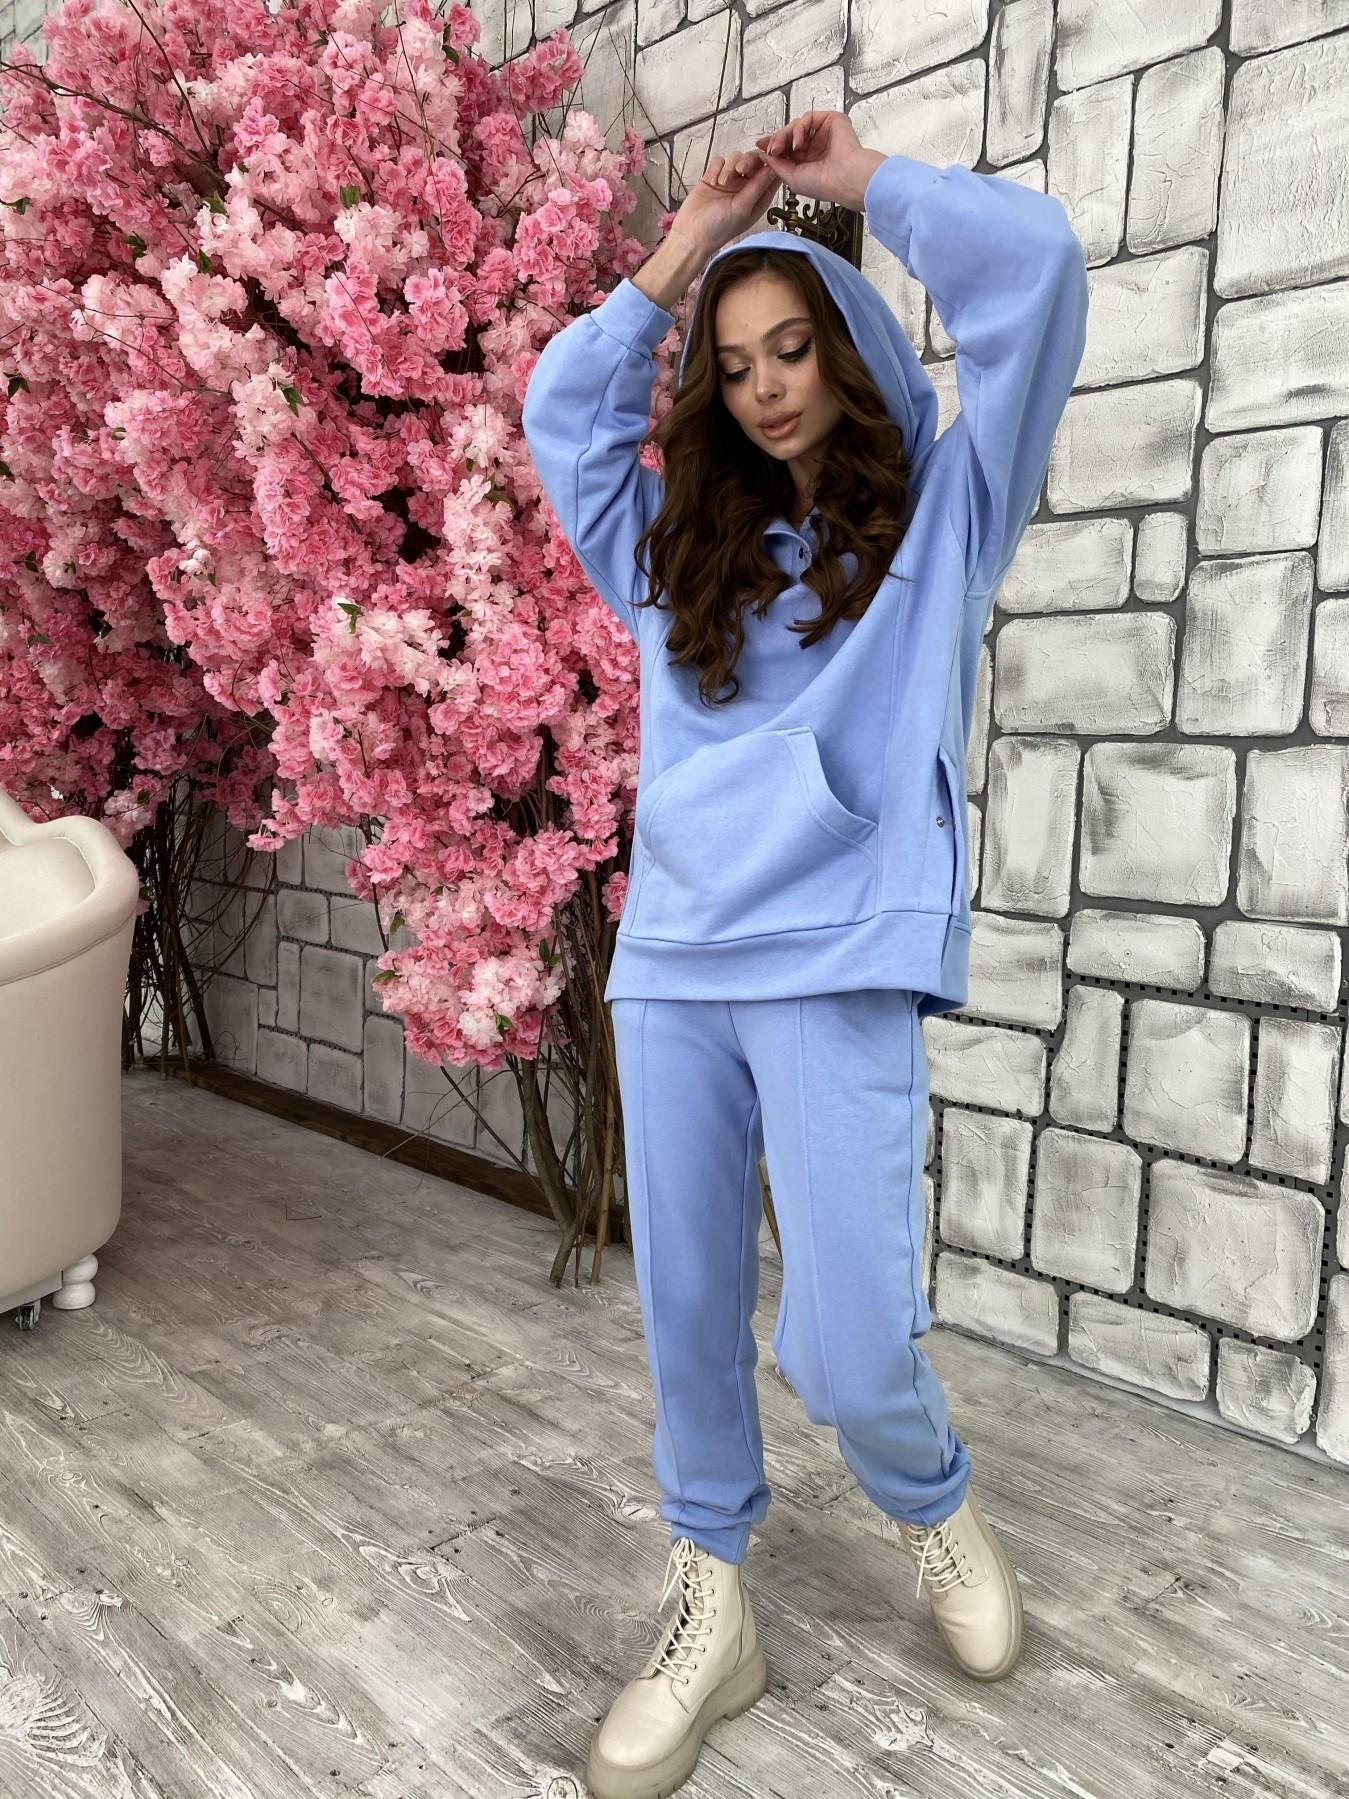 Лайф костюм  из 3х нитки 10782 АРТ. 47255 Цвет: Голубой - фото 5, интернет магазин tm-modus.ru